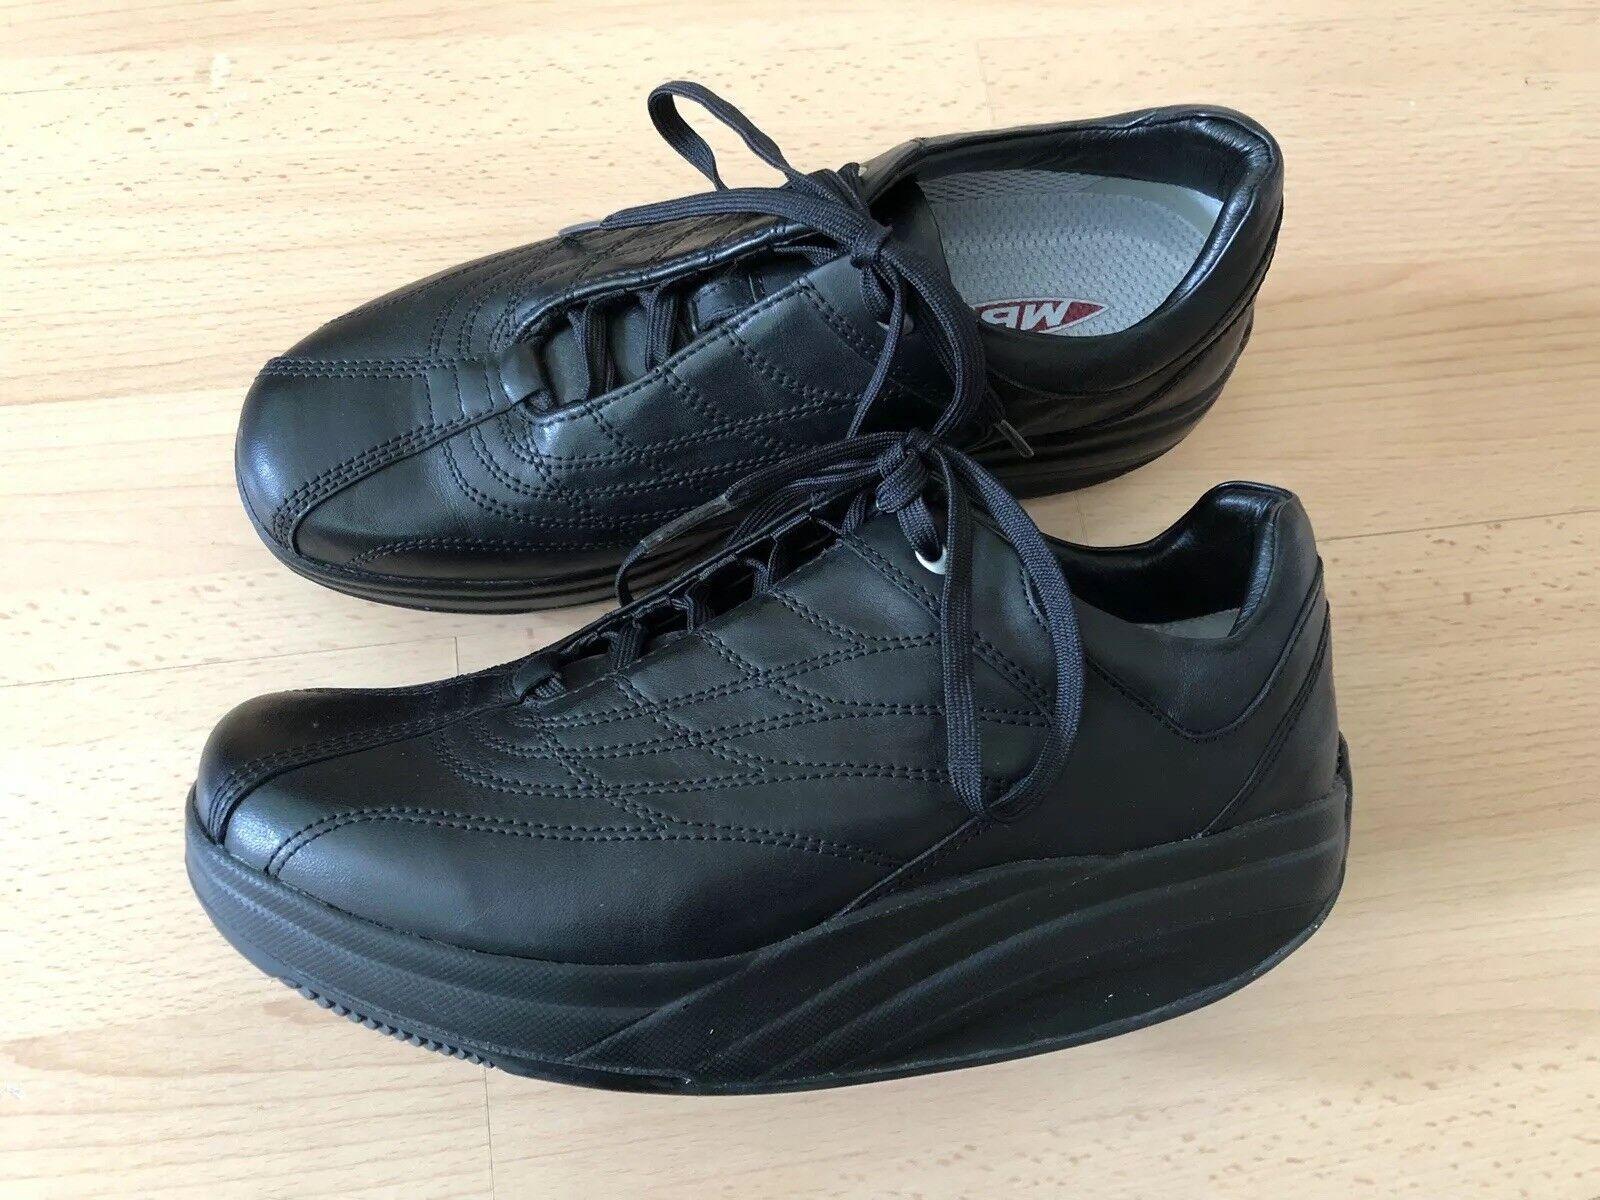 MBT Schuhe Damen Leder Gr. 39 3. Schwarz